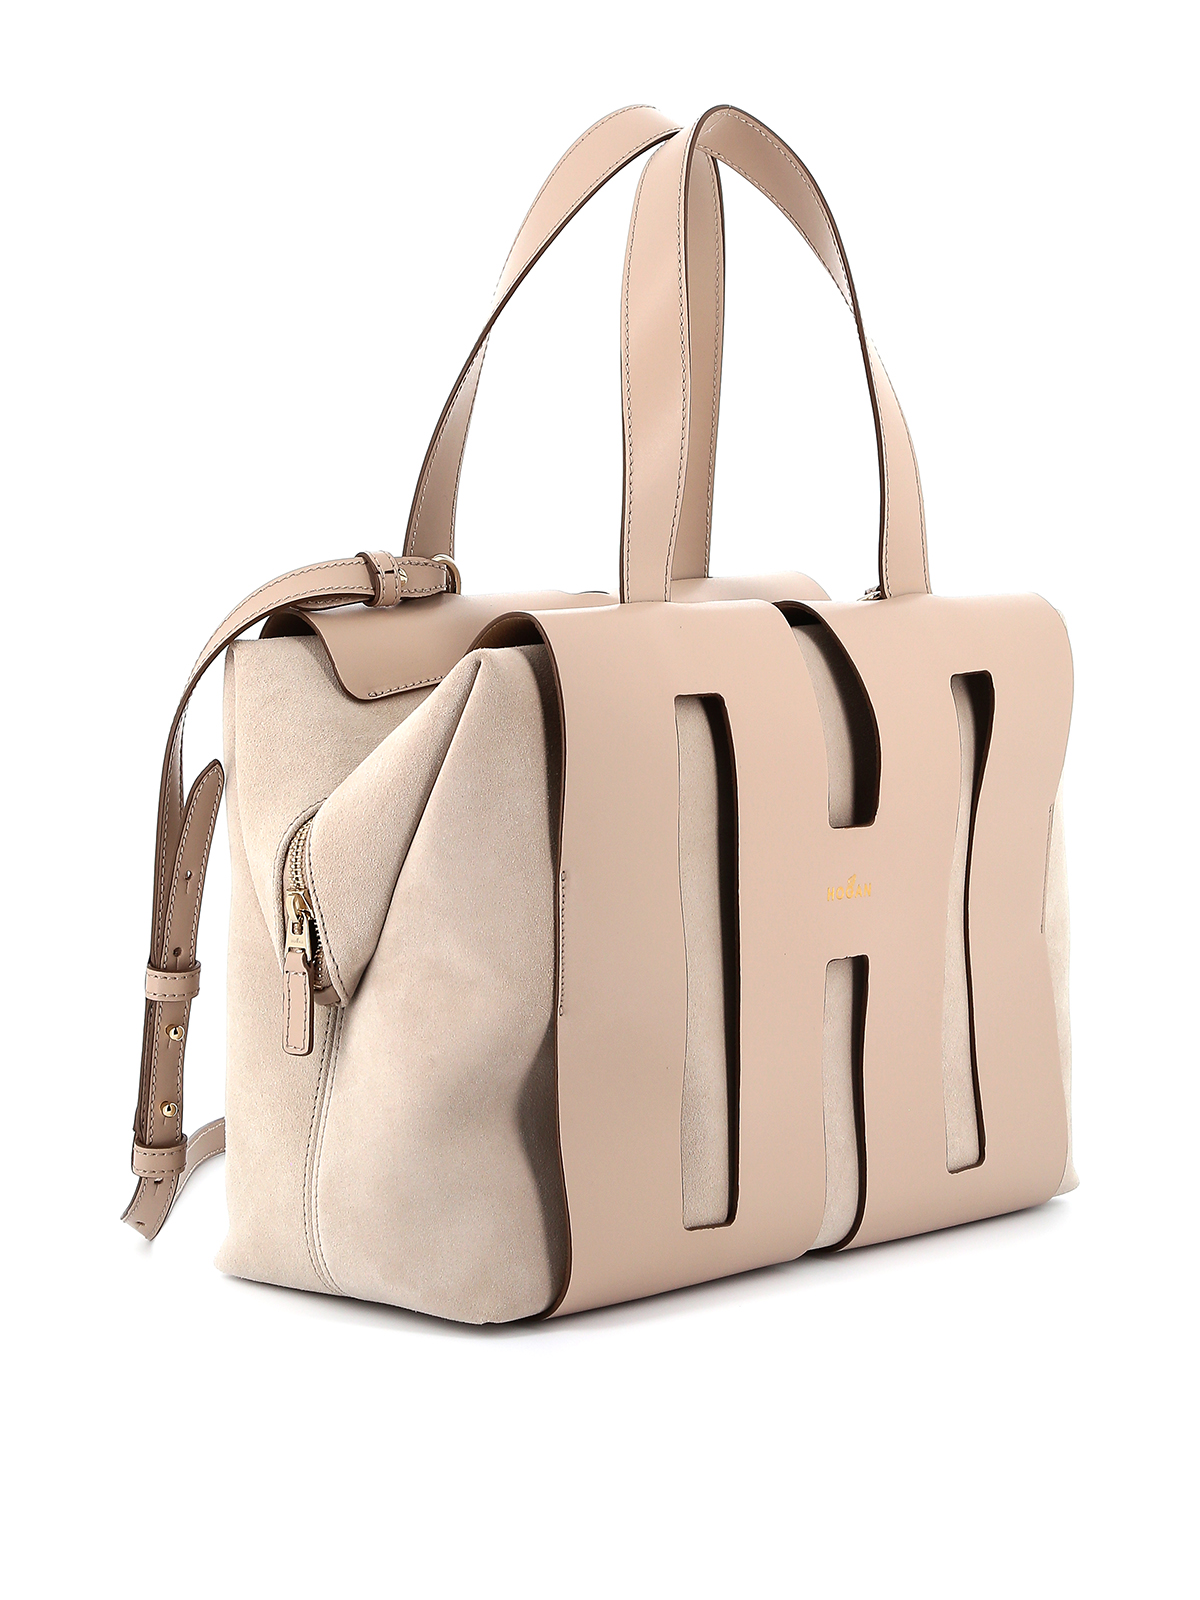 Hogan - Bi-Bag bowling bag - bowling bags - KBW015H0300LKKAP49 ...